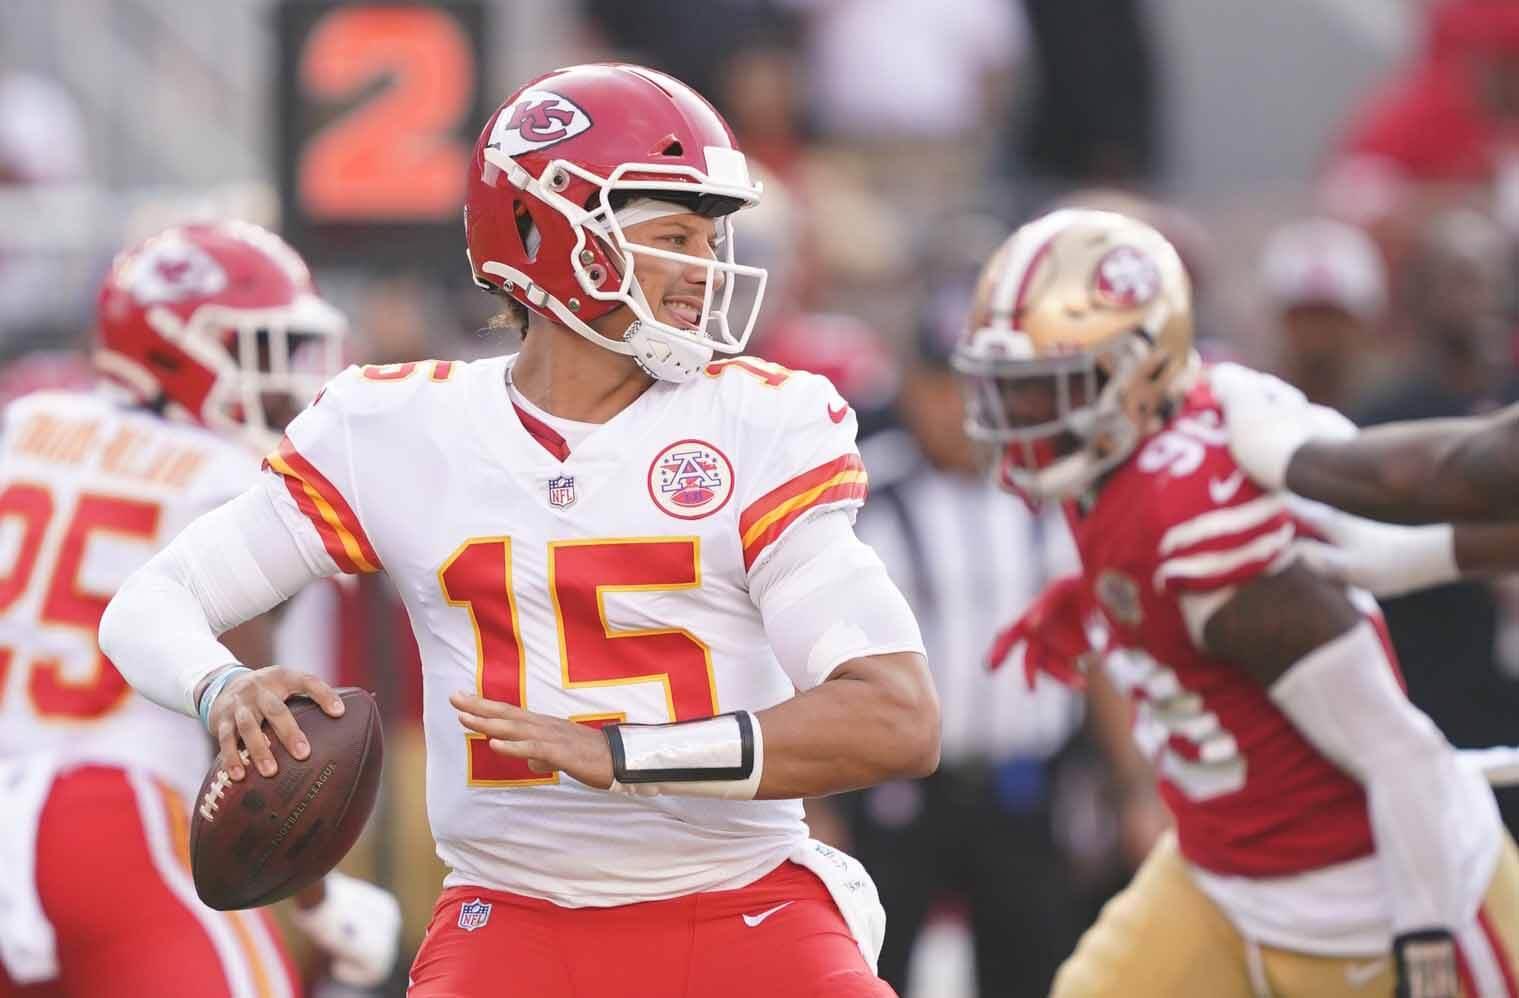 Kansas City Chiefs quarterback Patrick Mahomes (15) passes the football against the San Francisco 49ers during the first quarter at Levi's Stadium.